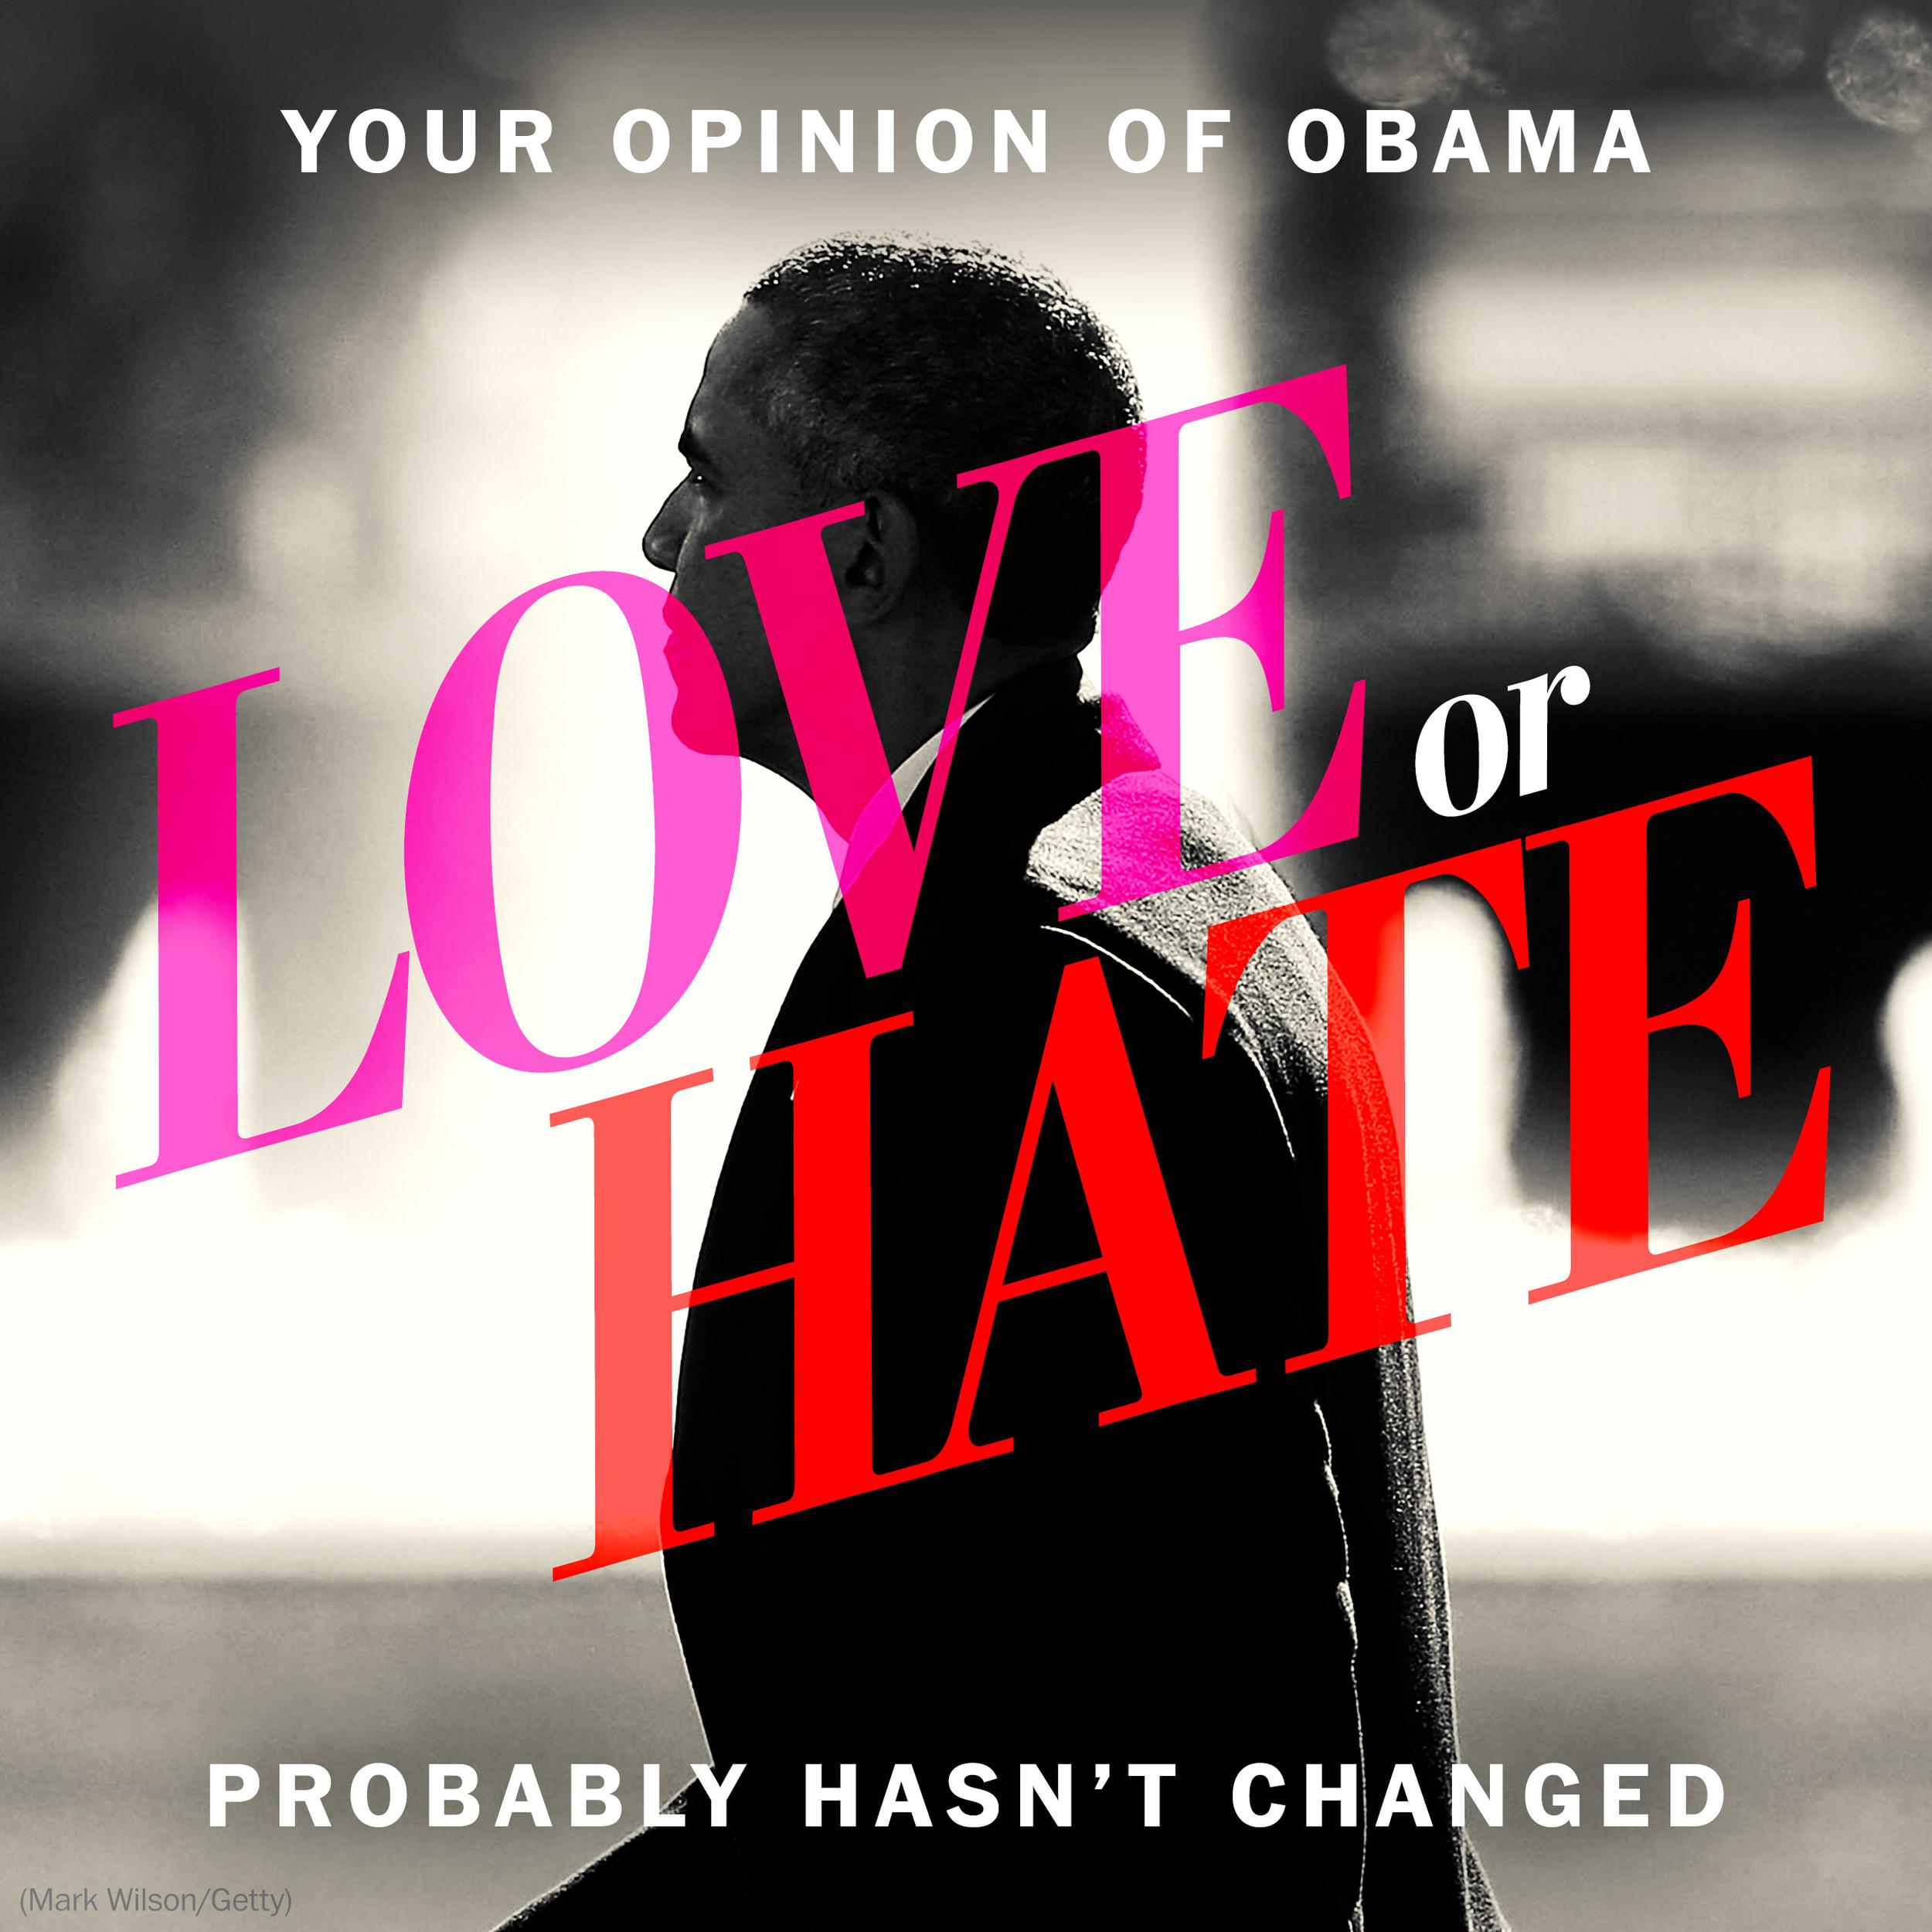 0116_ObamaLoveHate_B.jpg